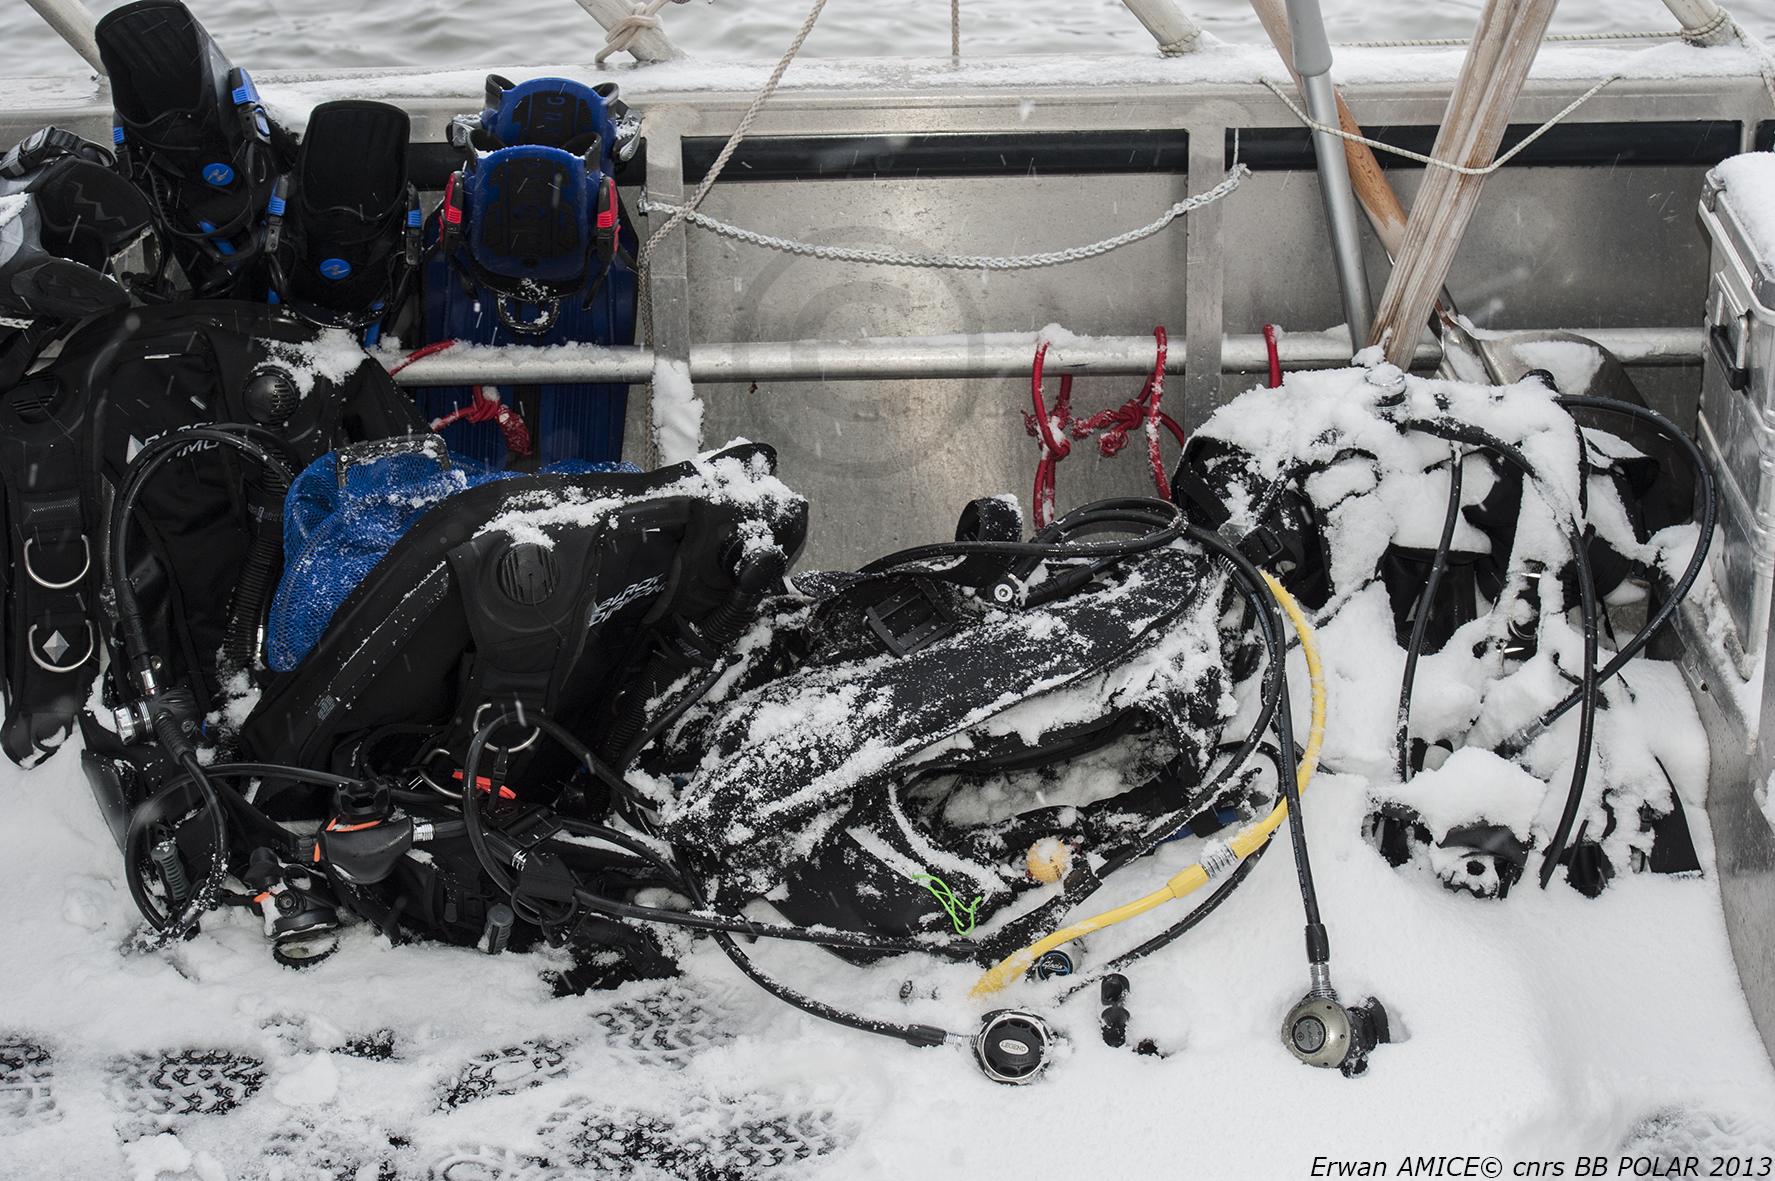 Equipment under snow